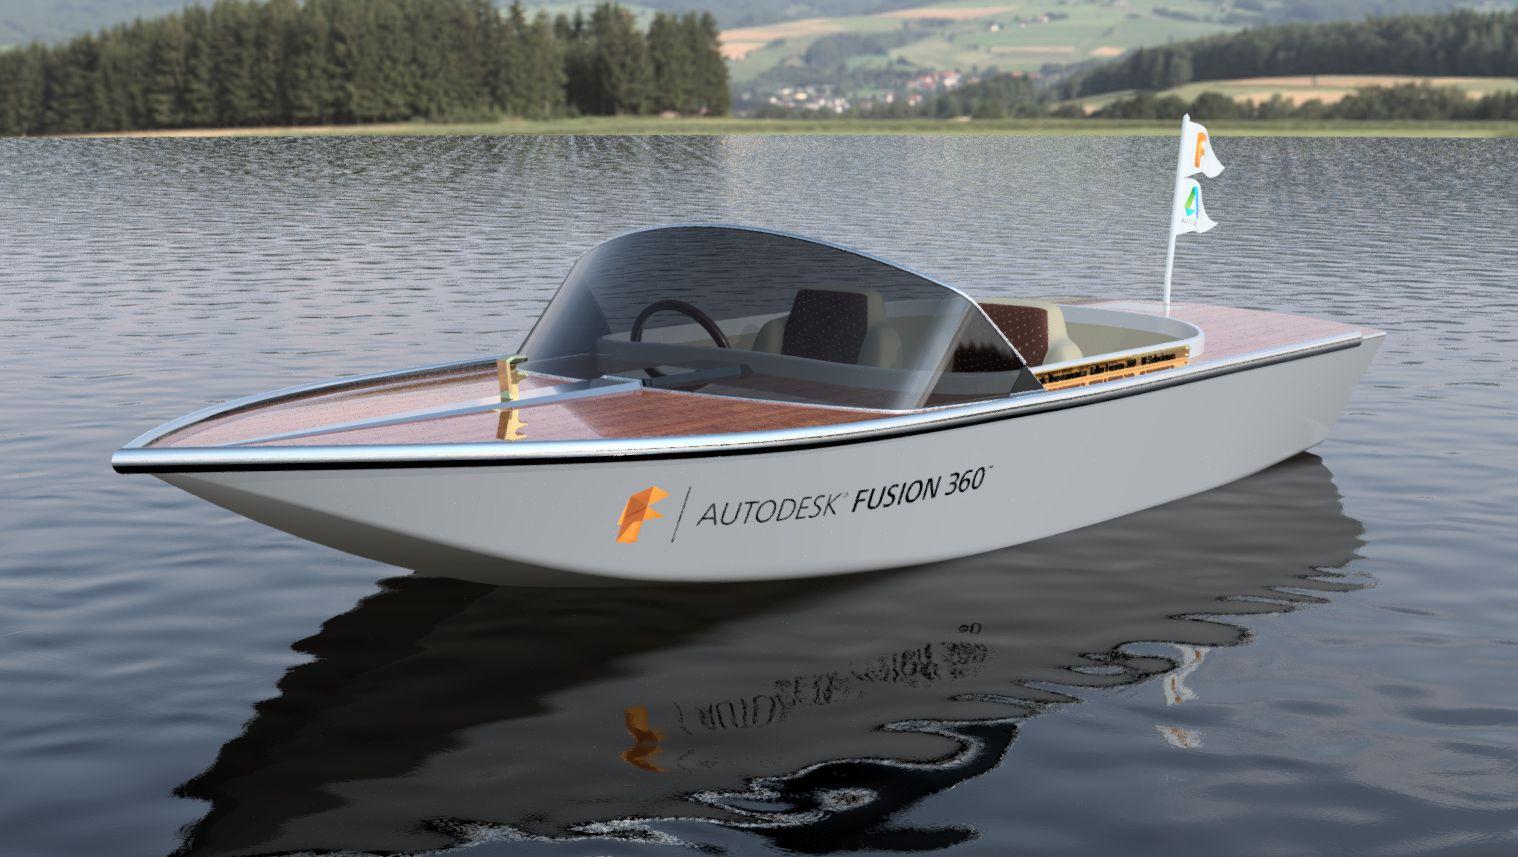 Nautilus-taller-fusion-completo-dgcr-v5-3500-3500